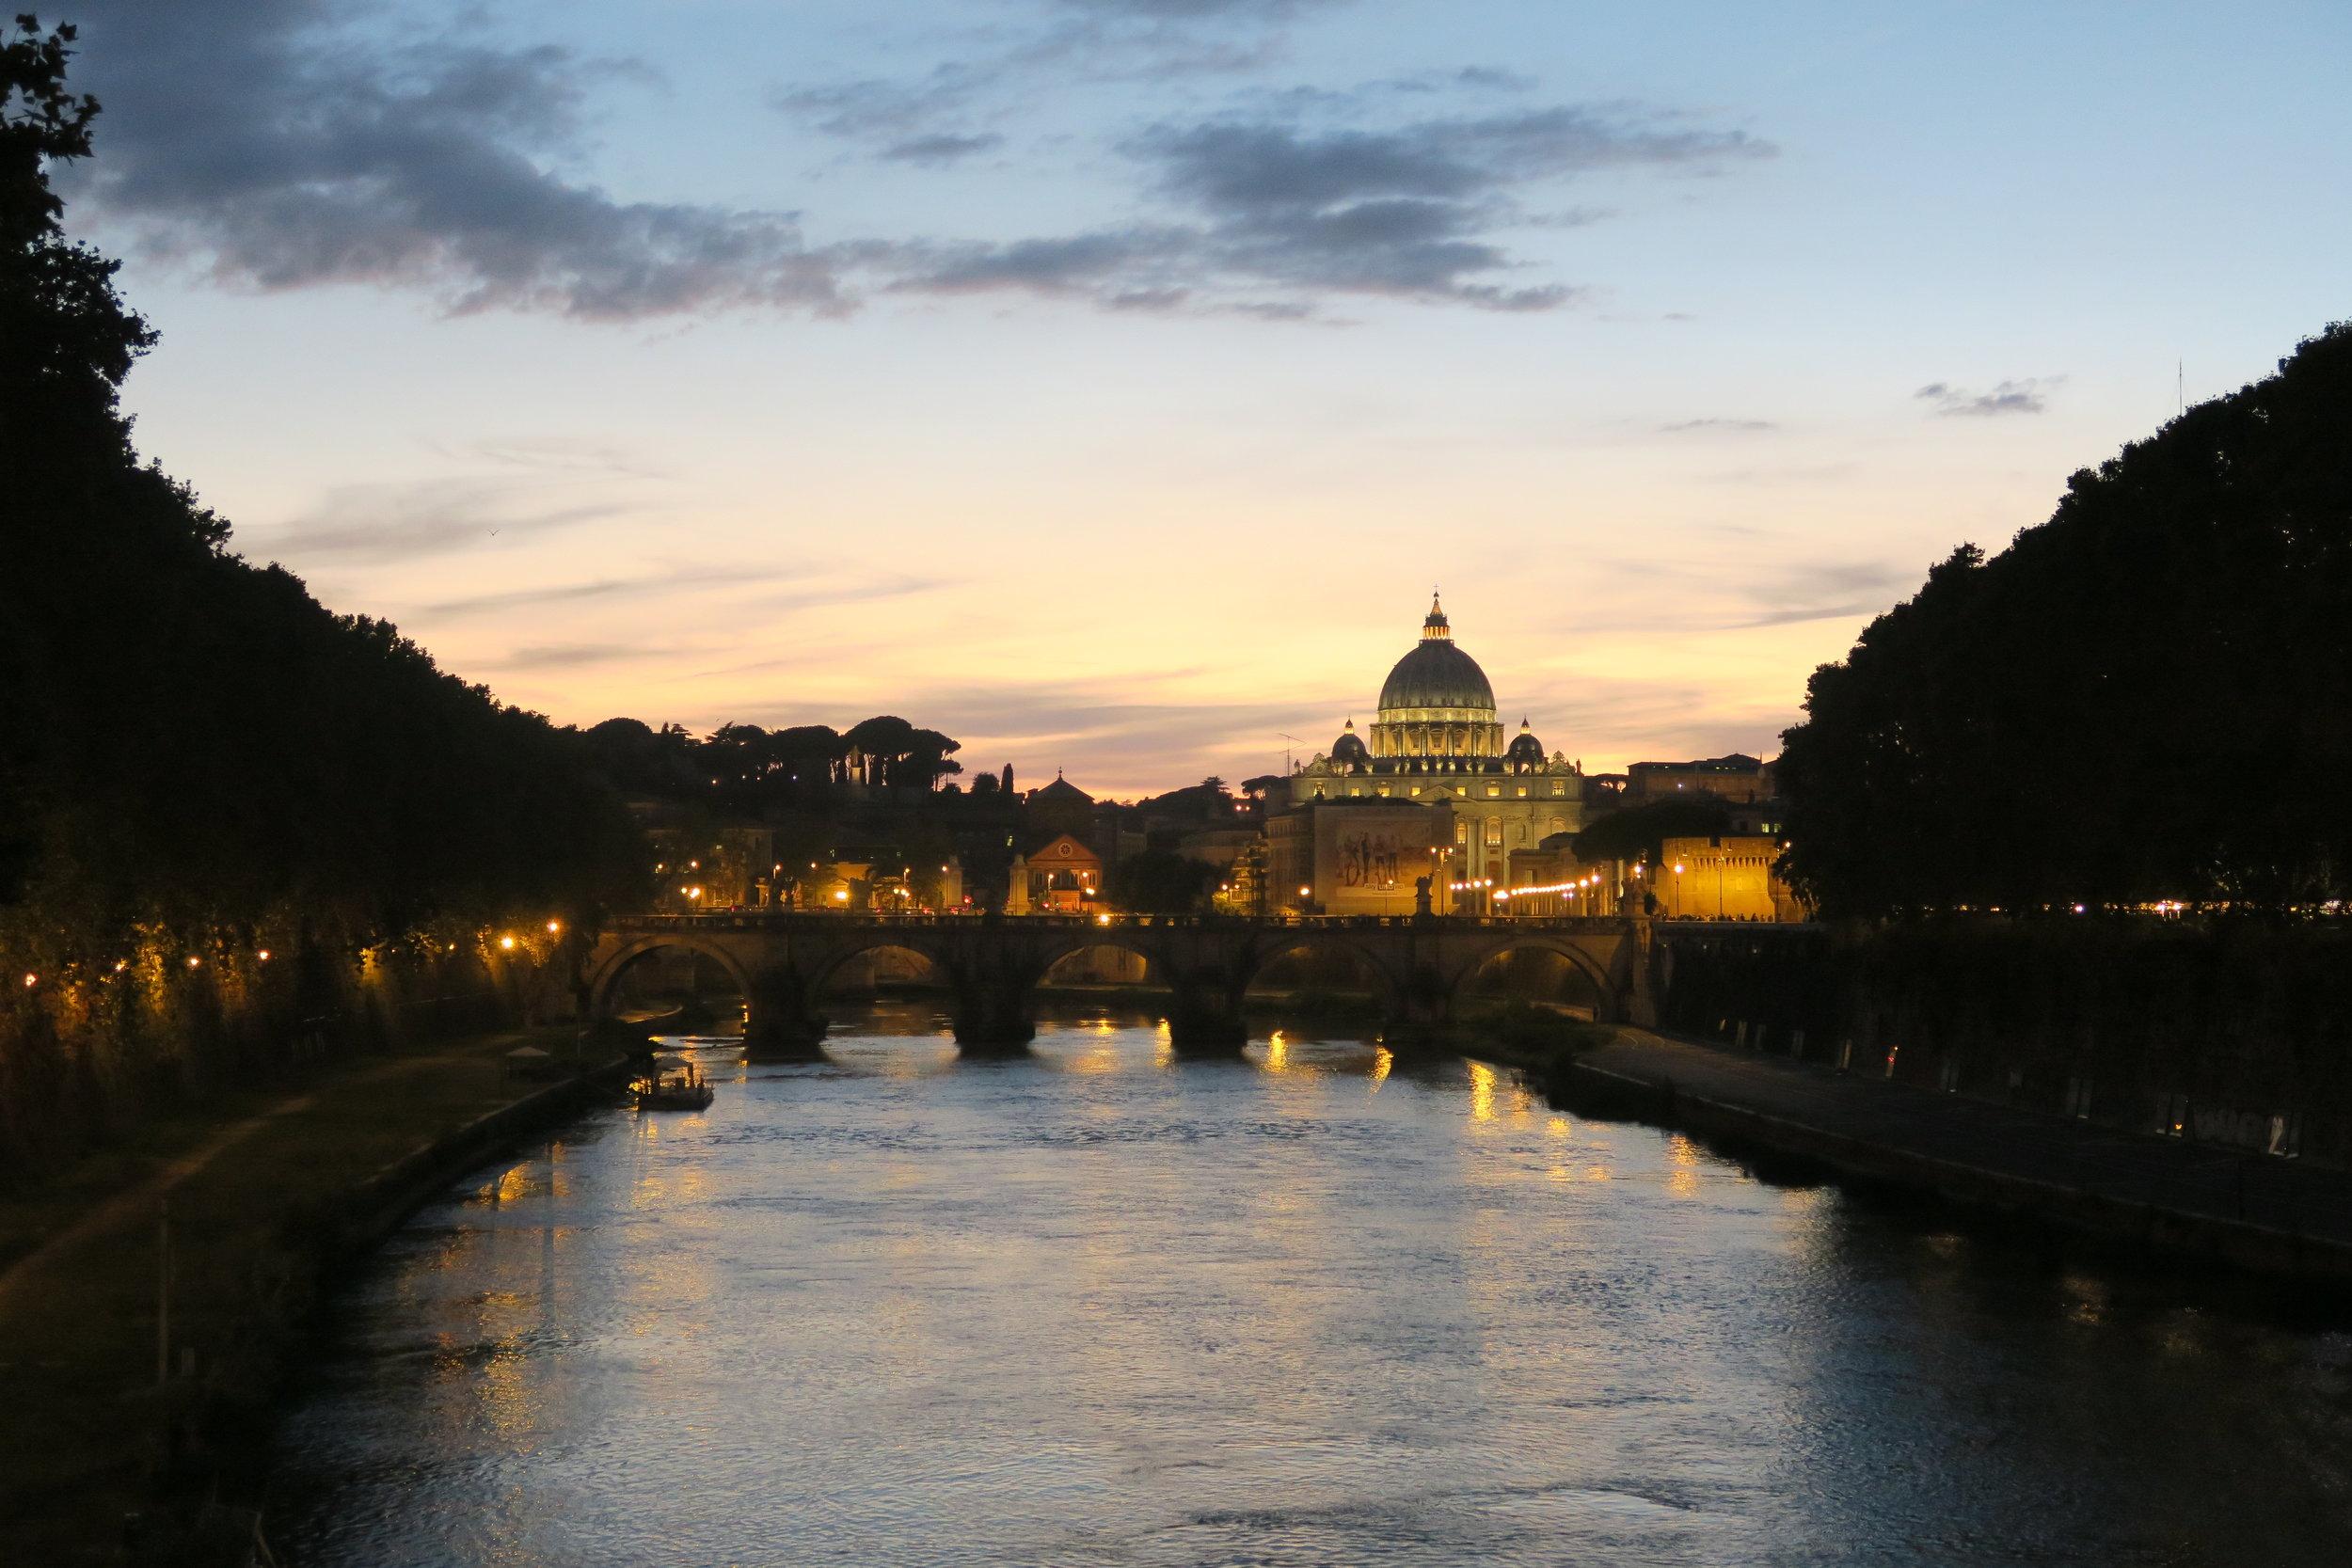 St. Peters Tiber at Night.JPG